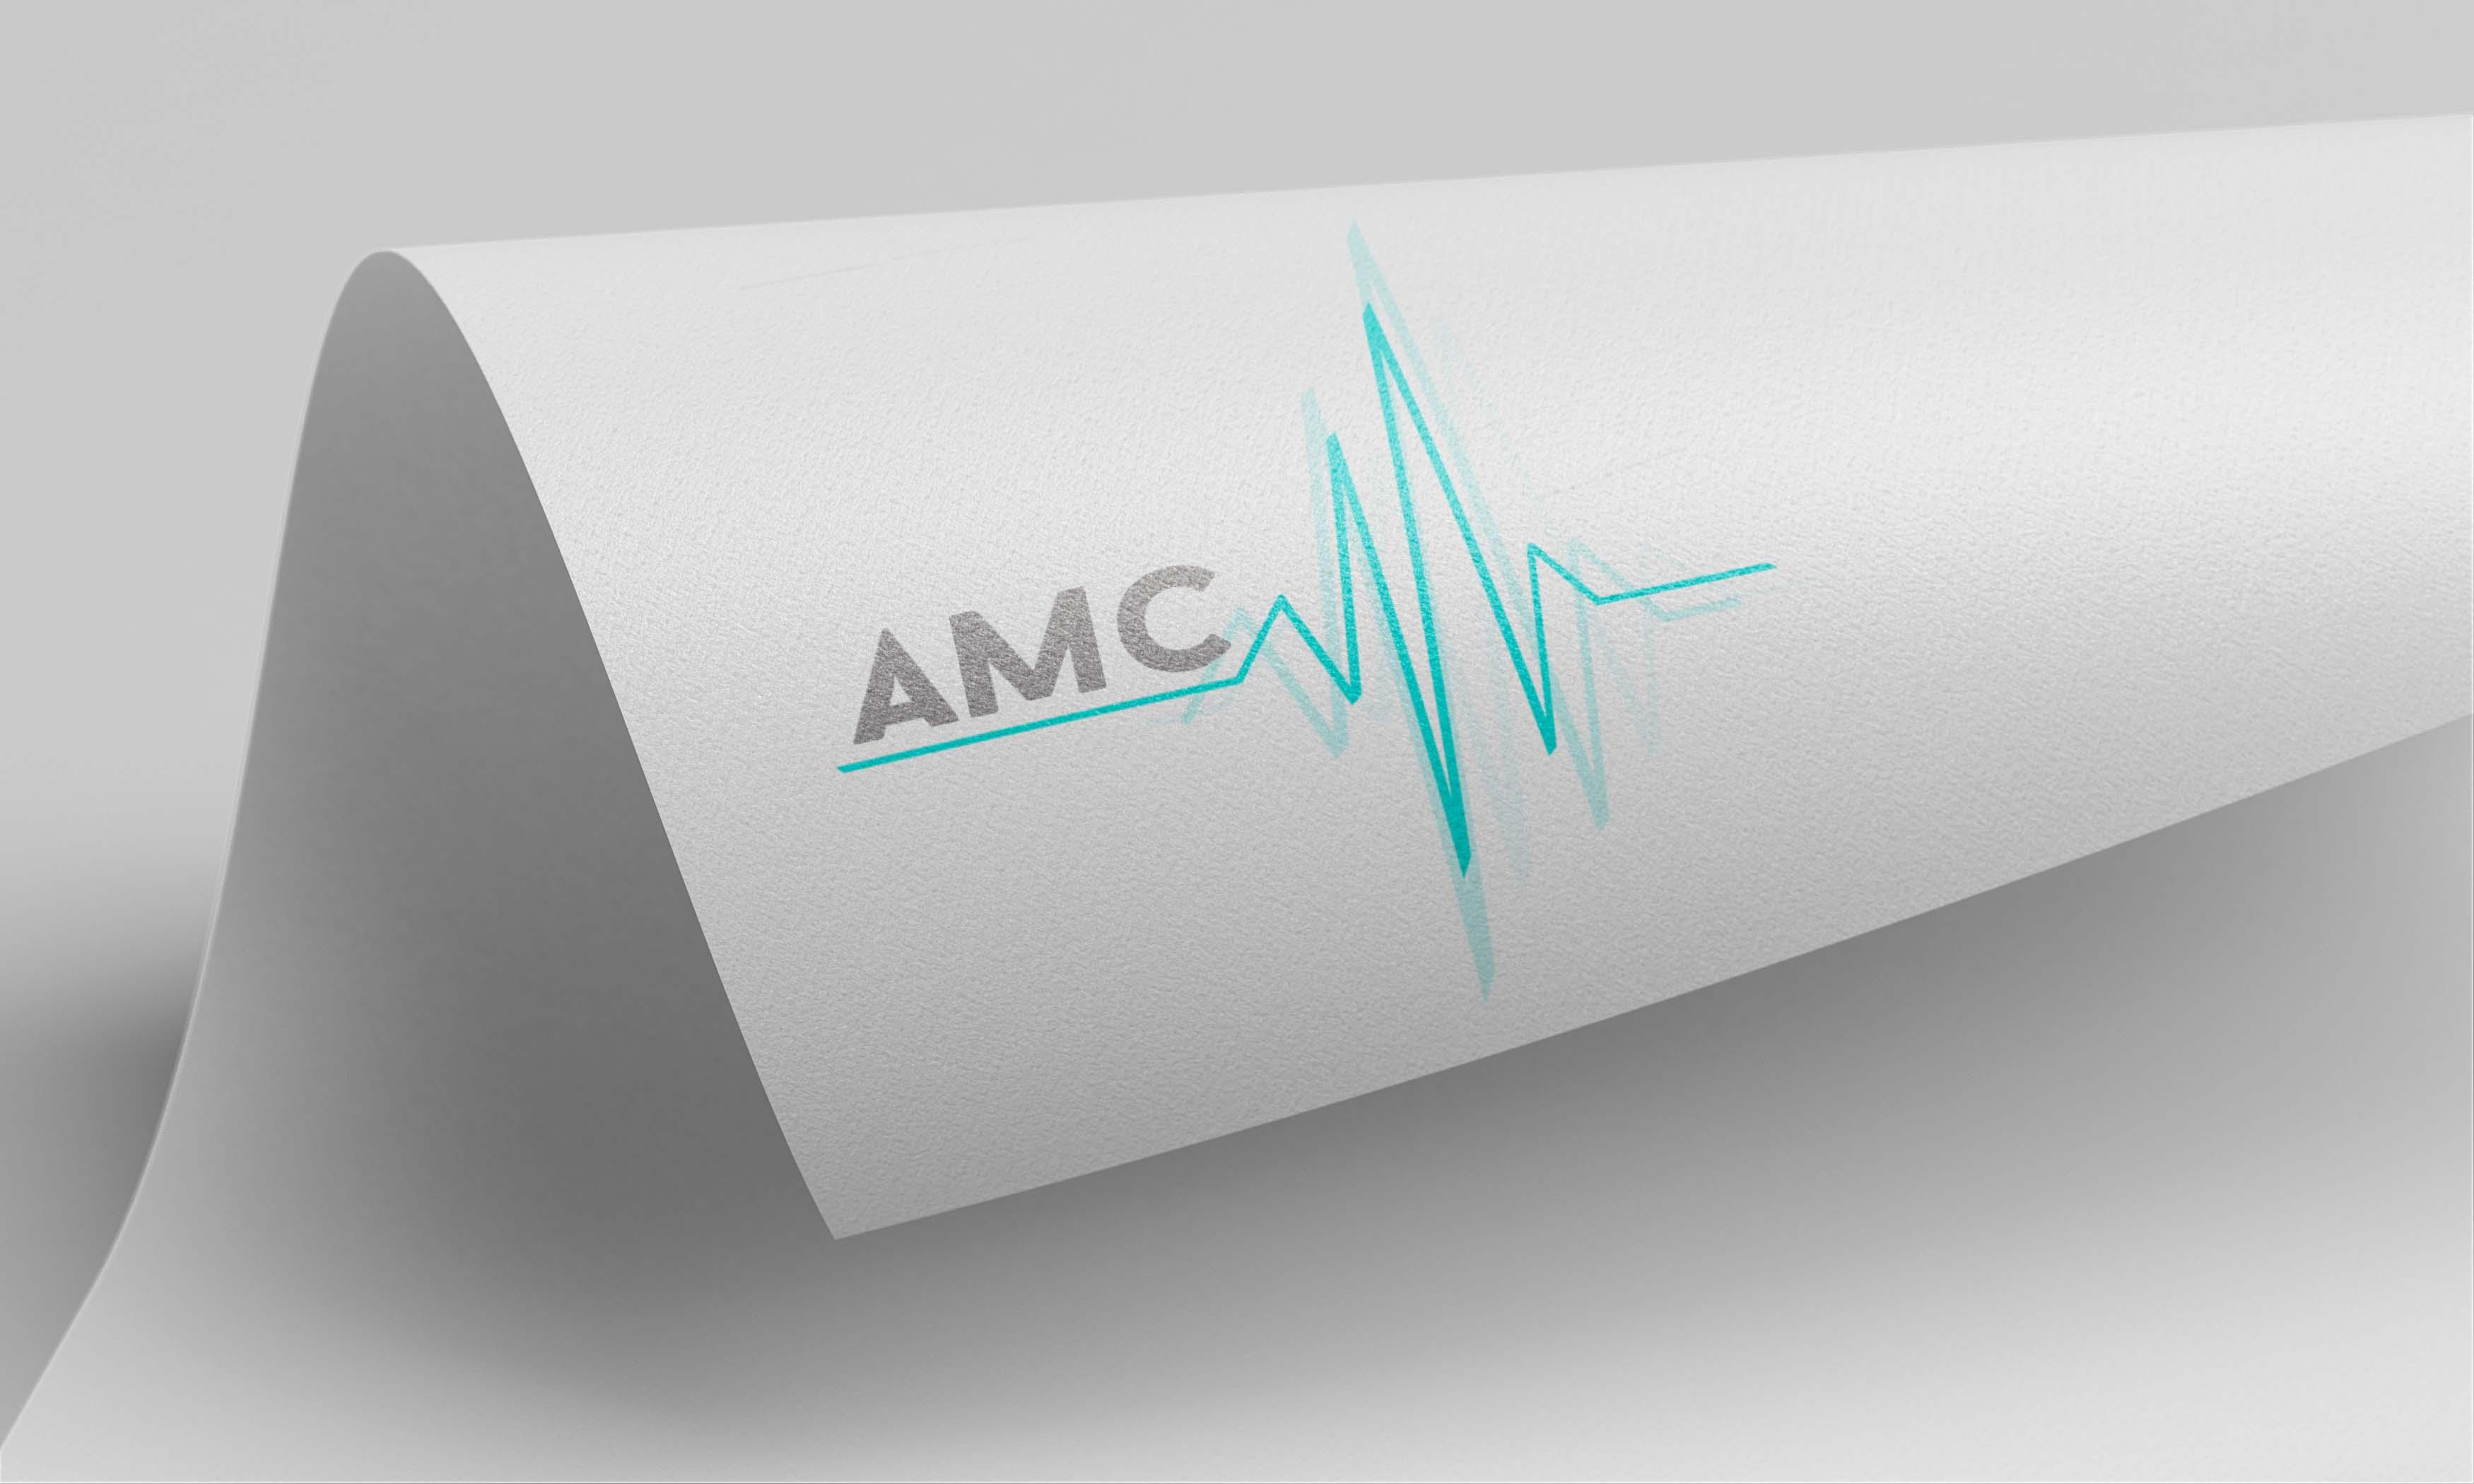 Логотип для медицинского центра (клиники)  фото f_8185b983e6935e14.jpg